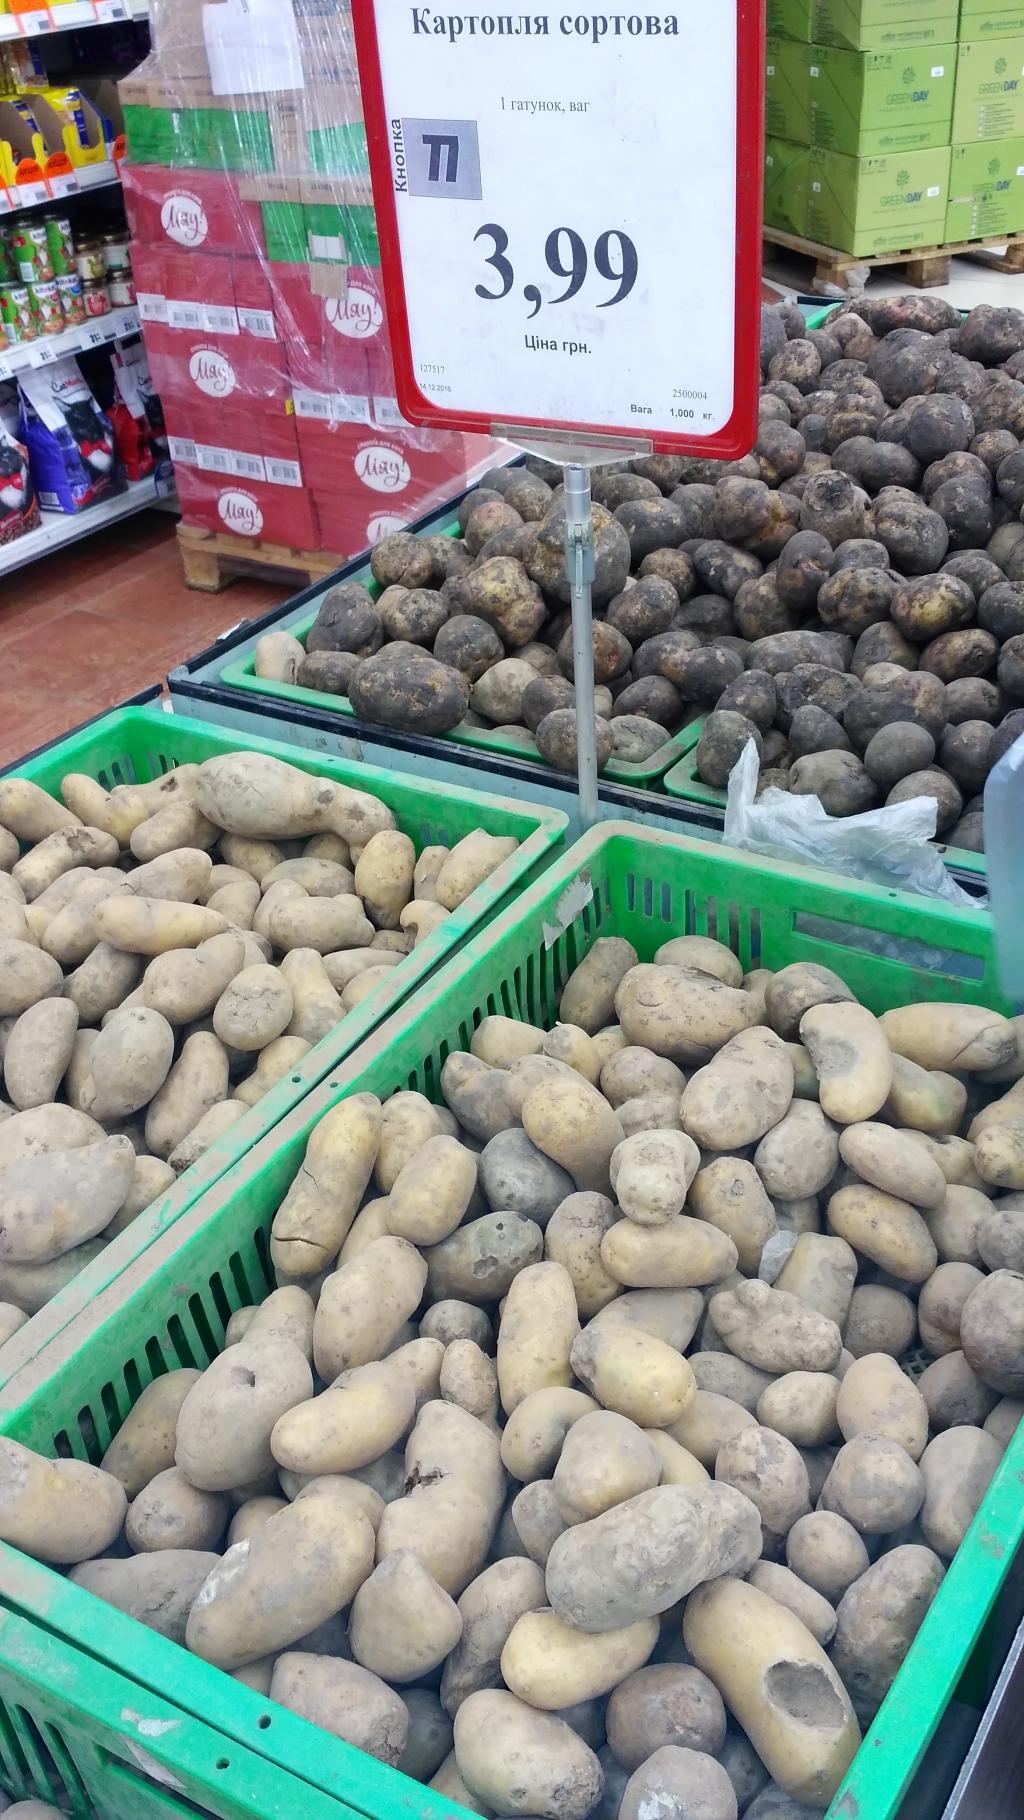 Varus market, Запорожье - Вот такую картошку предлагают купить в Varus в Запорожье на Космосе